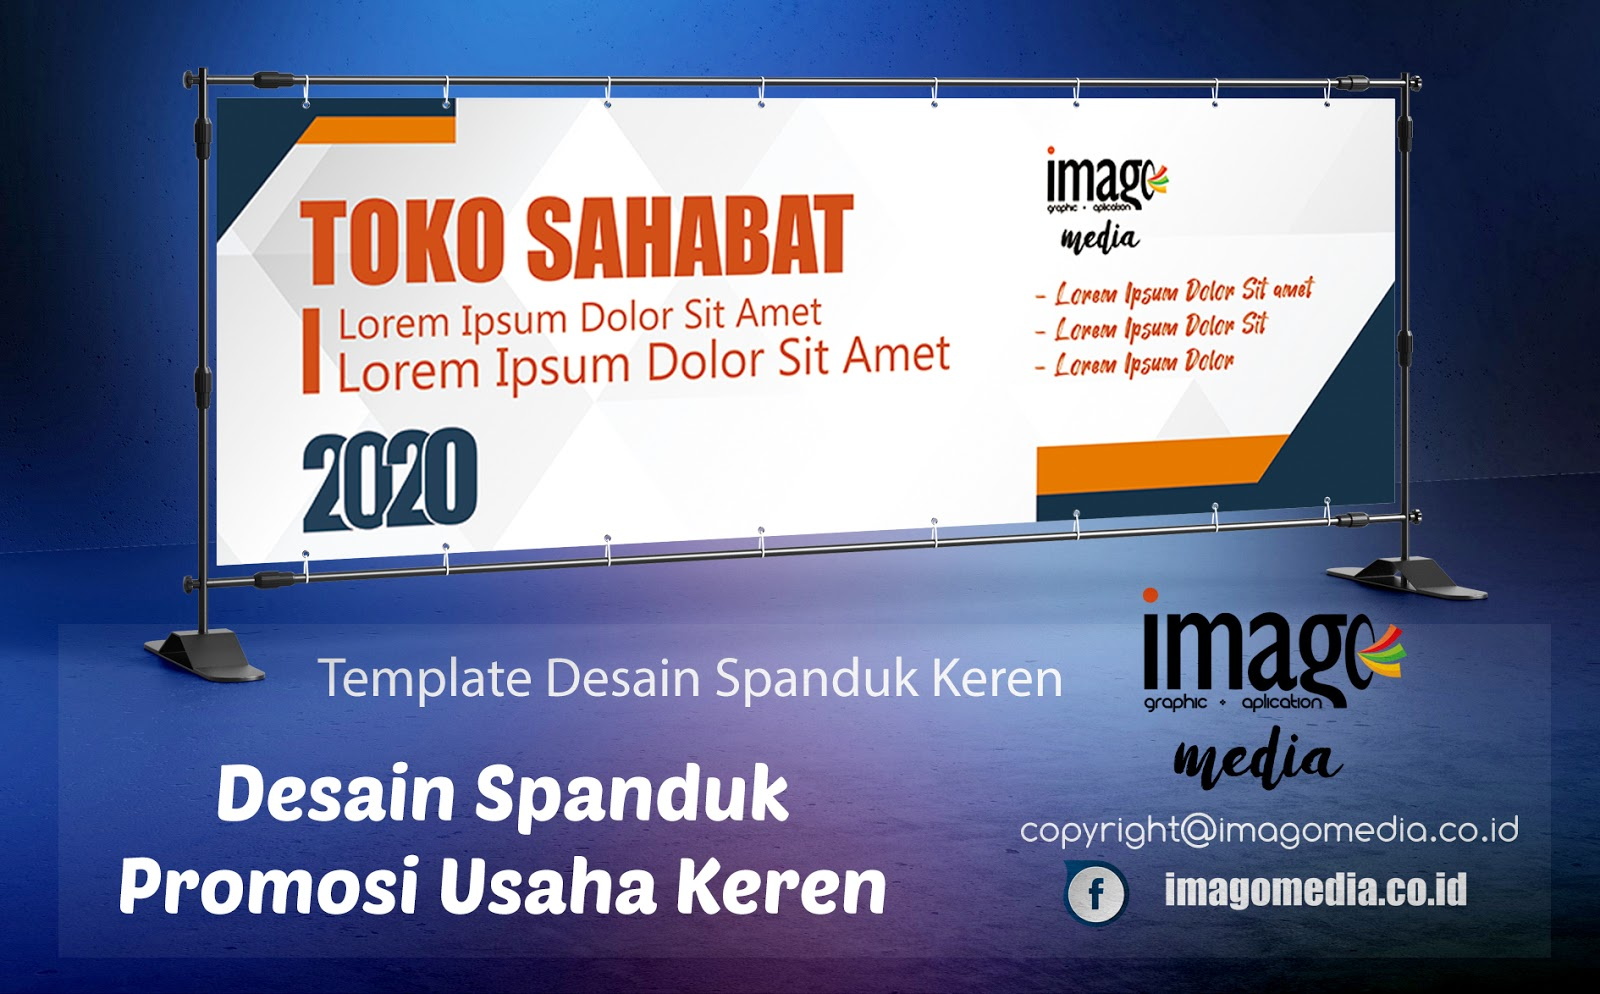 Desain Spanduk Promosi Usaha Keren - Imago Media   Home Of ...